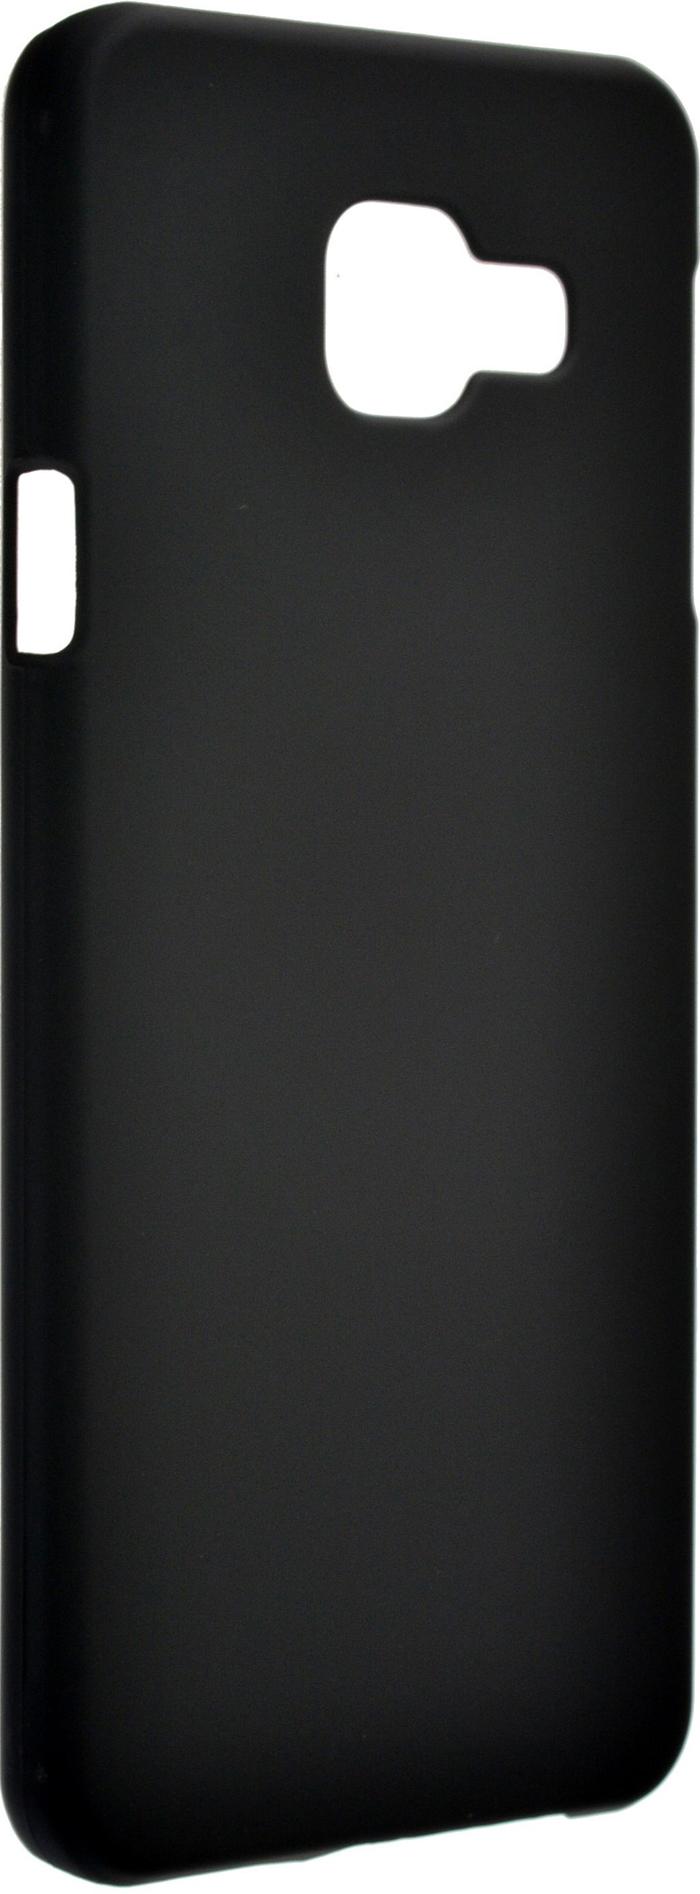 SkinBox для Samsung Galaxy A3 (2016) Серия 4People чёрный